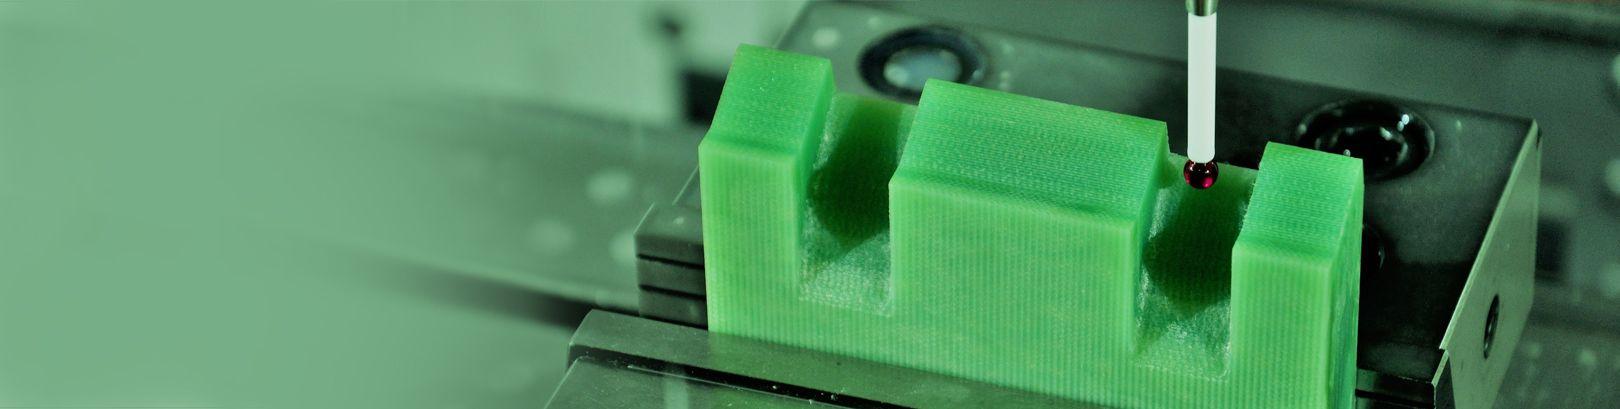 Wemi - Processing of thermosetting plastics